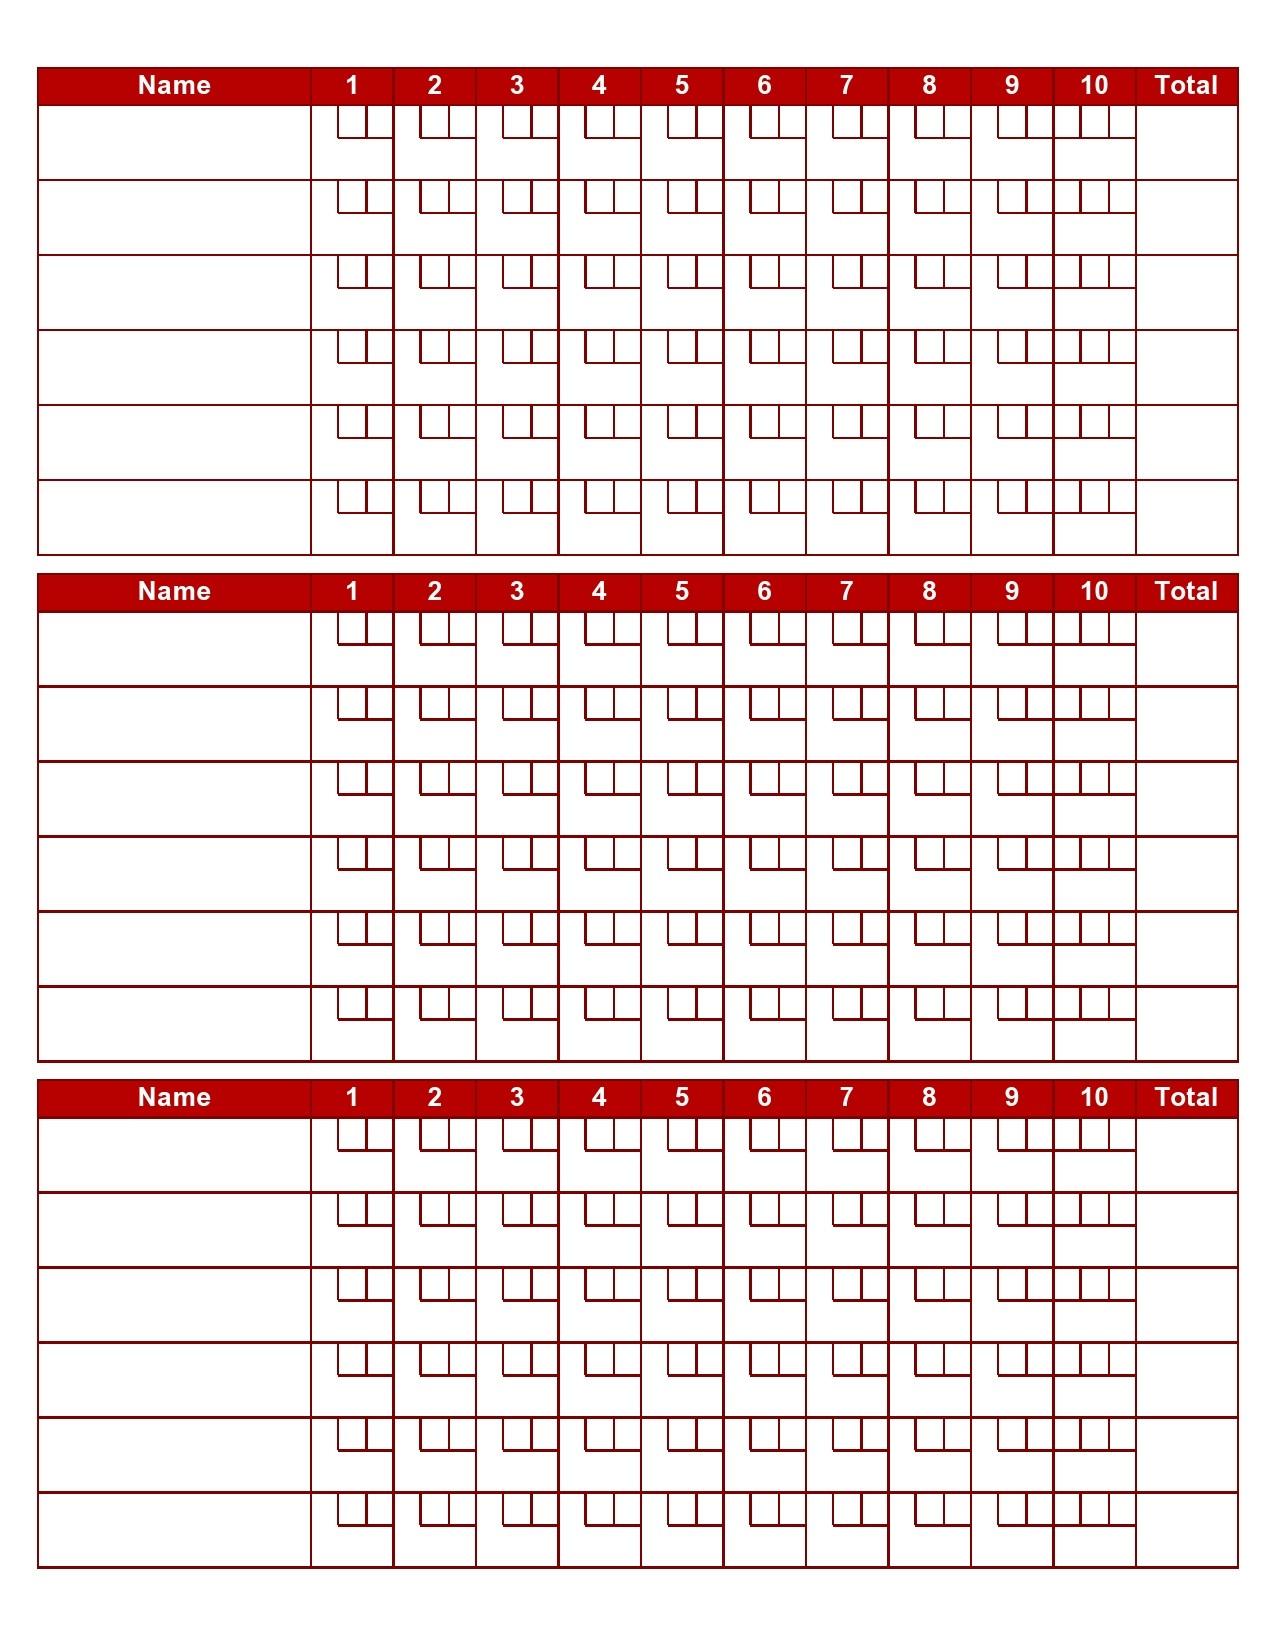 Free bowling score sheet 14